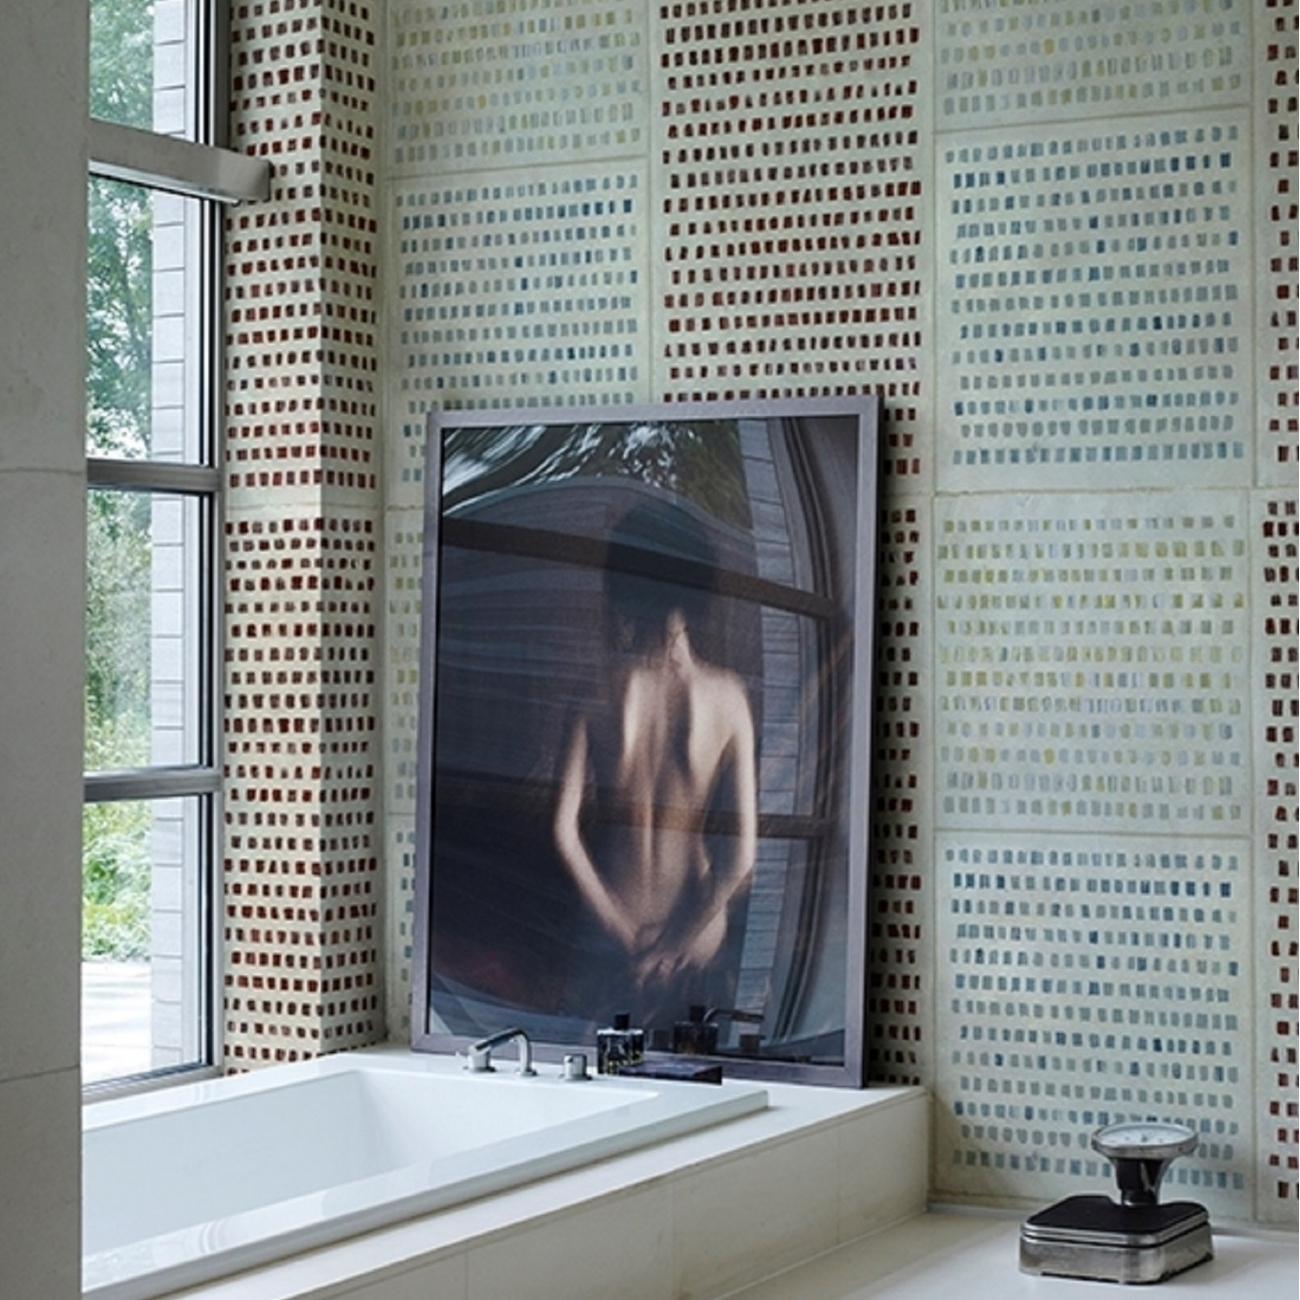 Wall & Decò WET SYSTEM CHANGING DOTS WALLPAPER